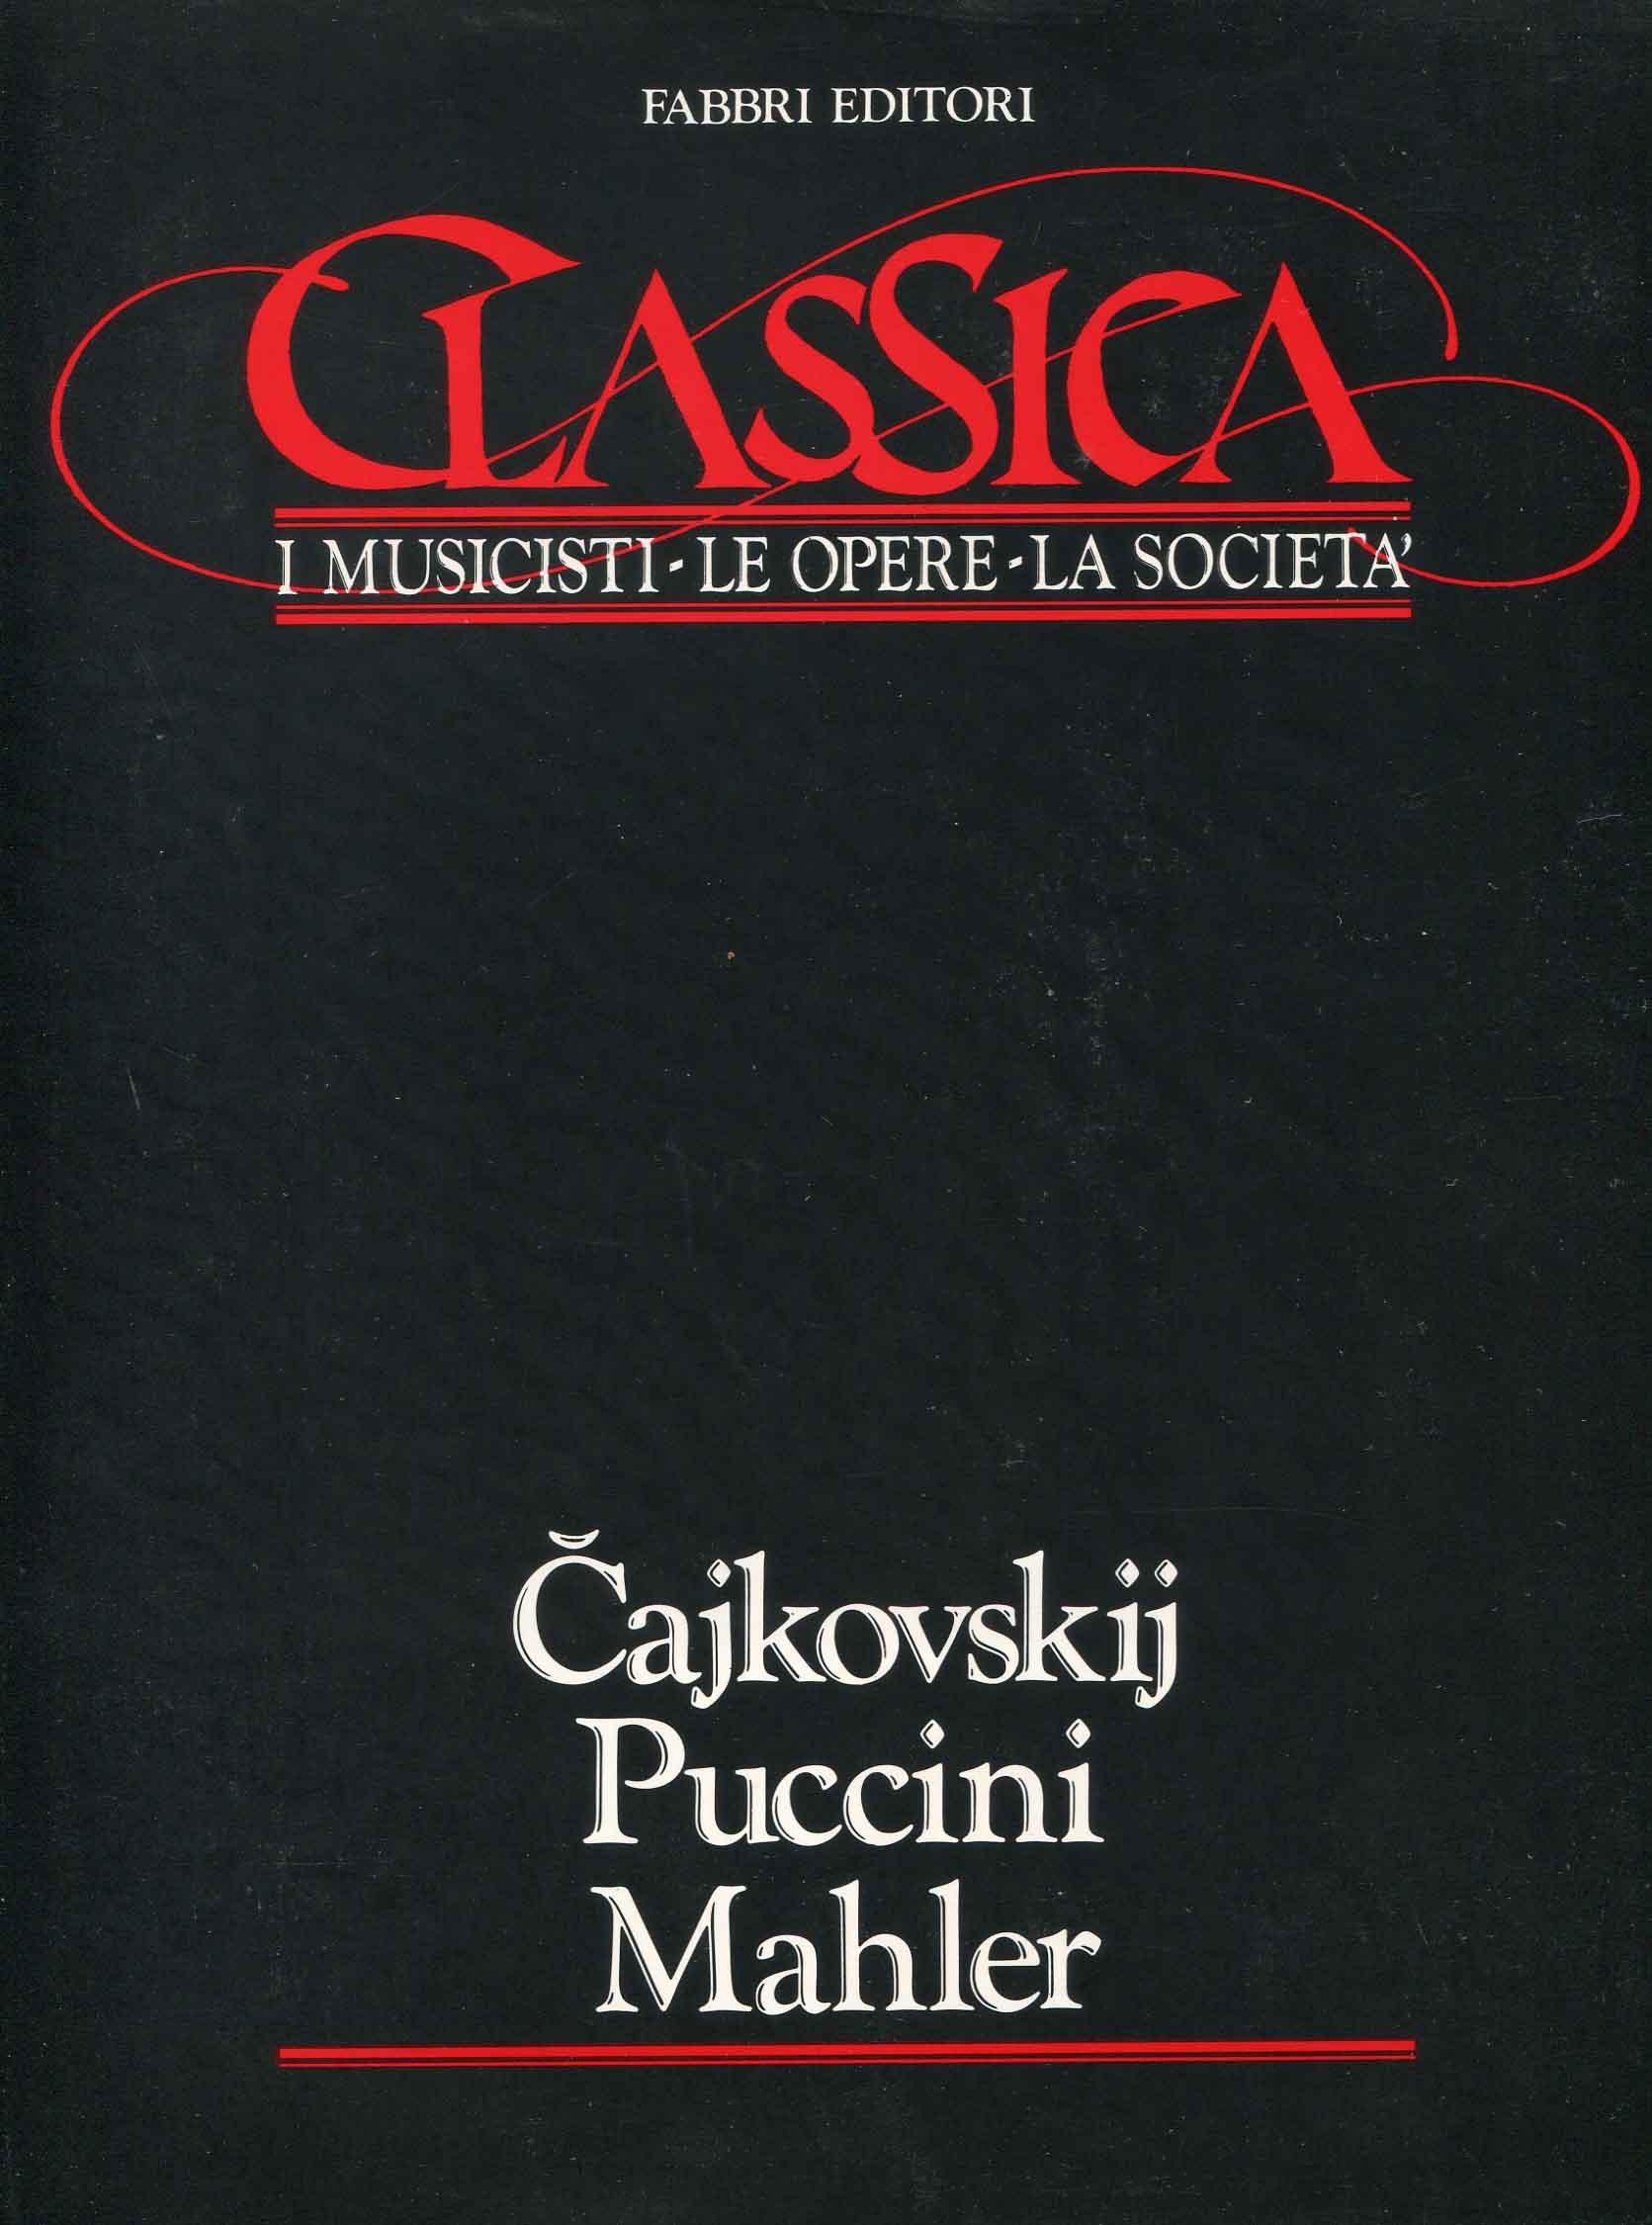 6: Cajkovskij, Puccini, Mahler